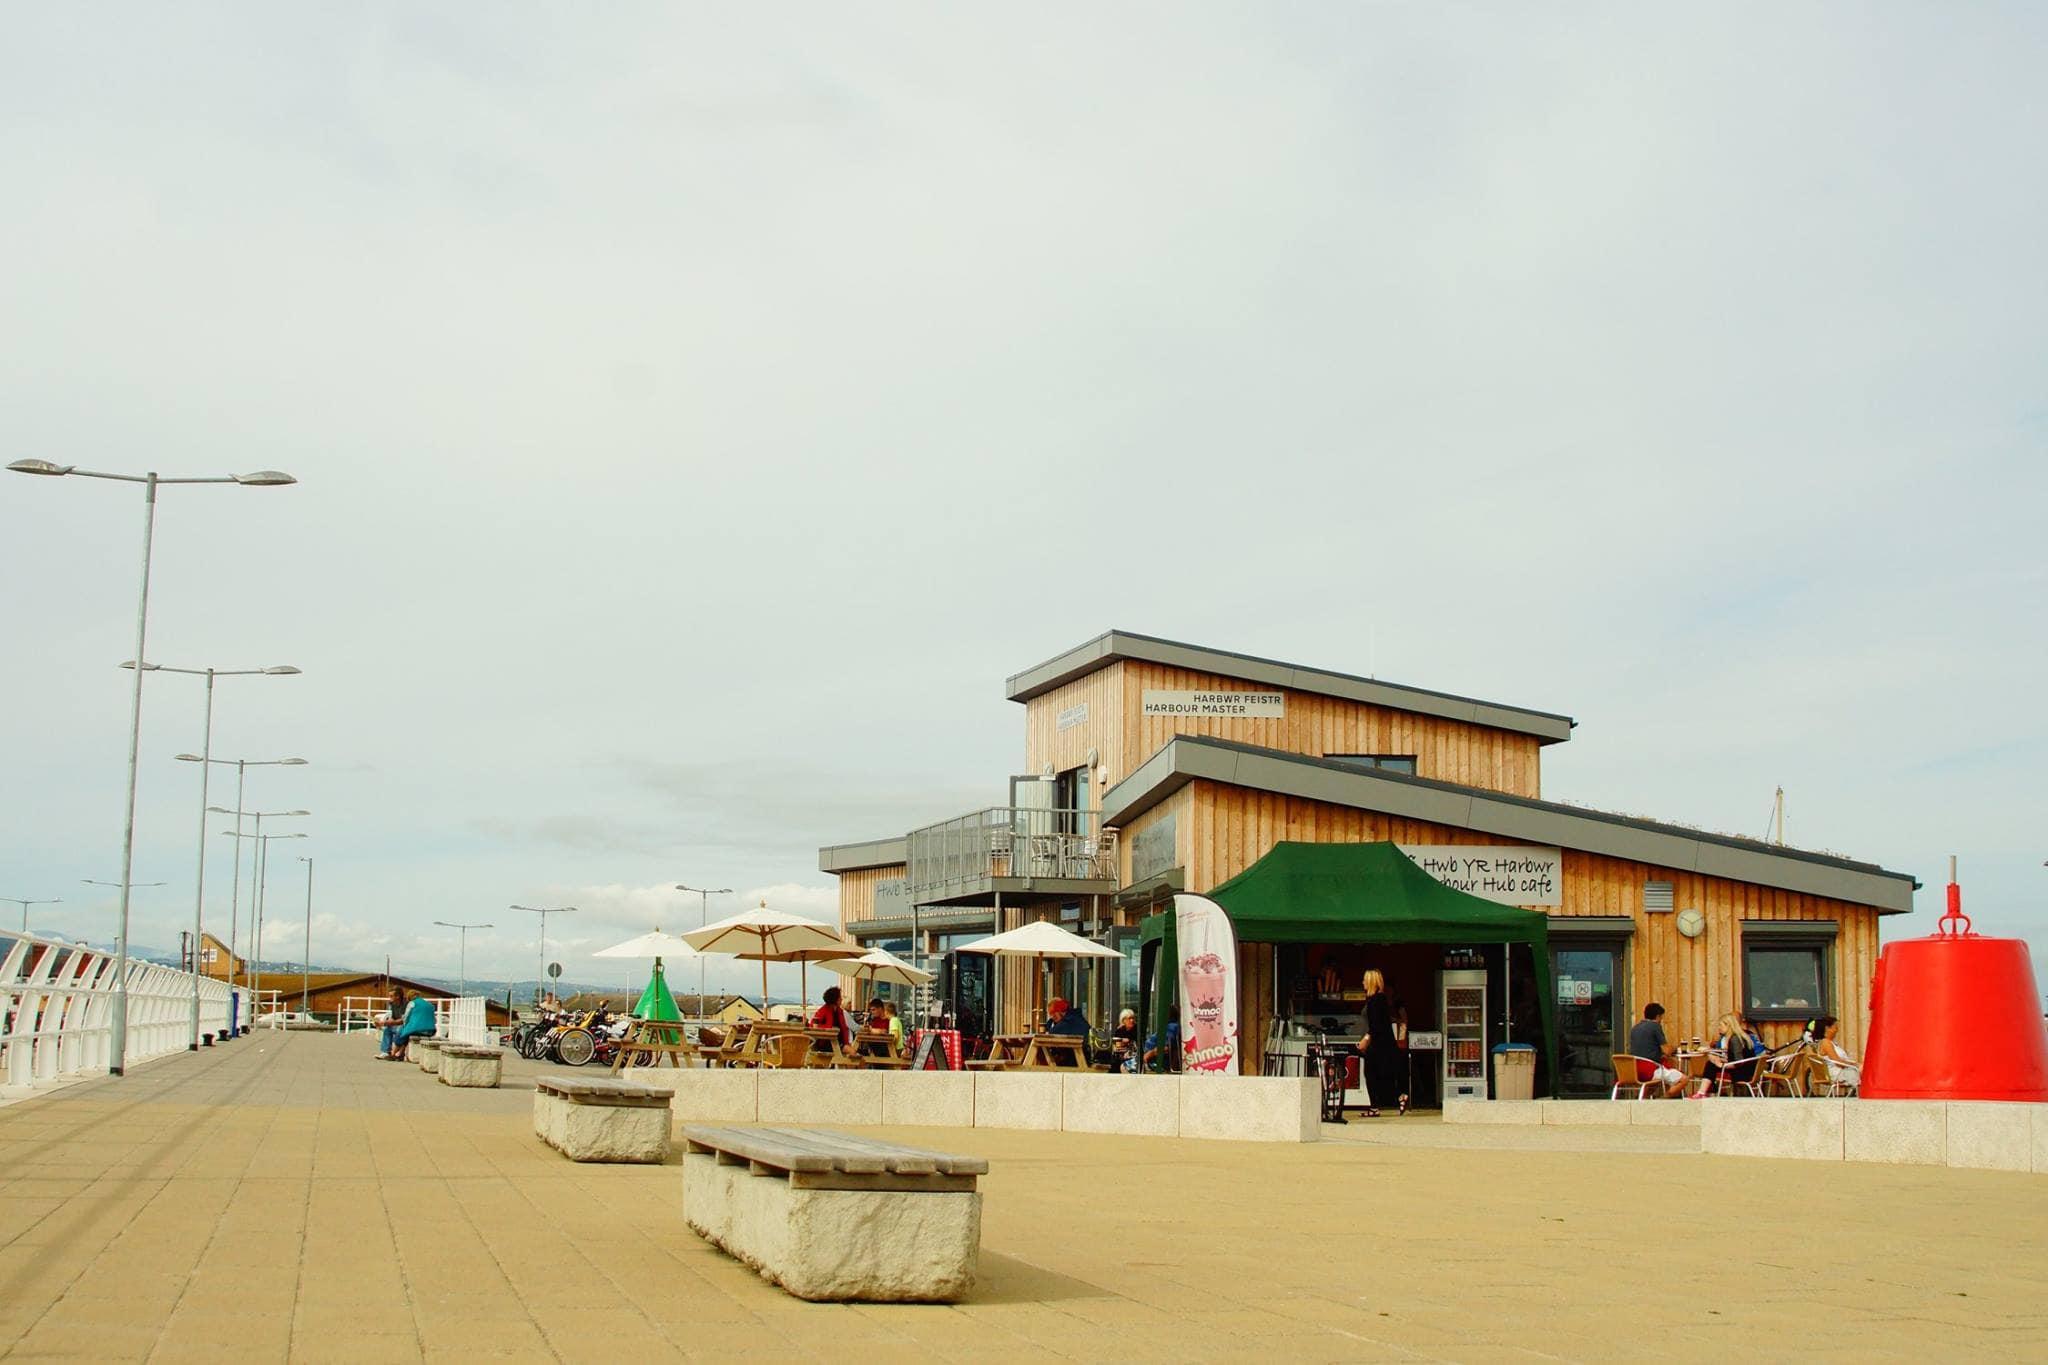 Harbour Hub Cafe, Rhyl